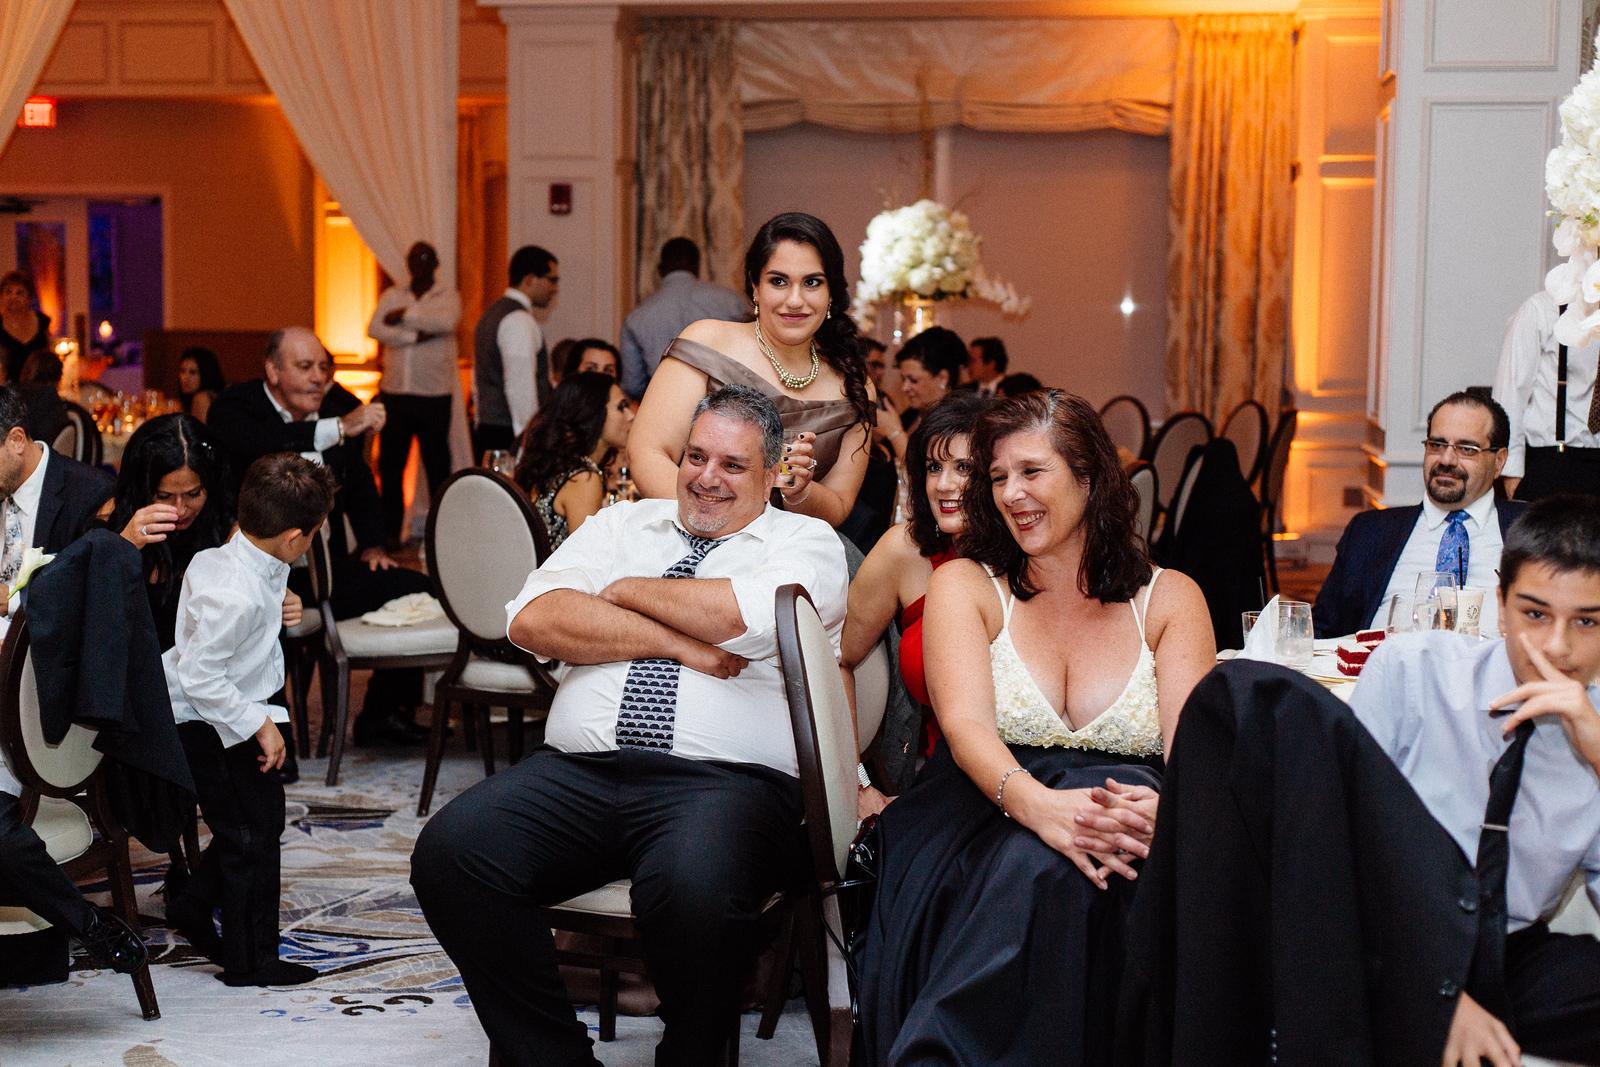 South-Florida-Wedding-Photographer-Andreo-5D3_5450